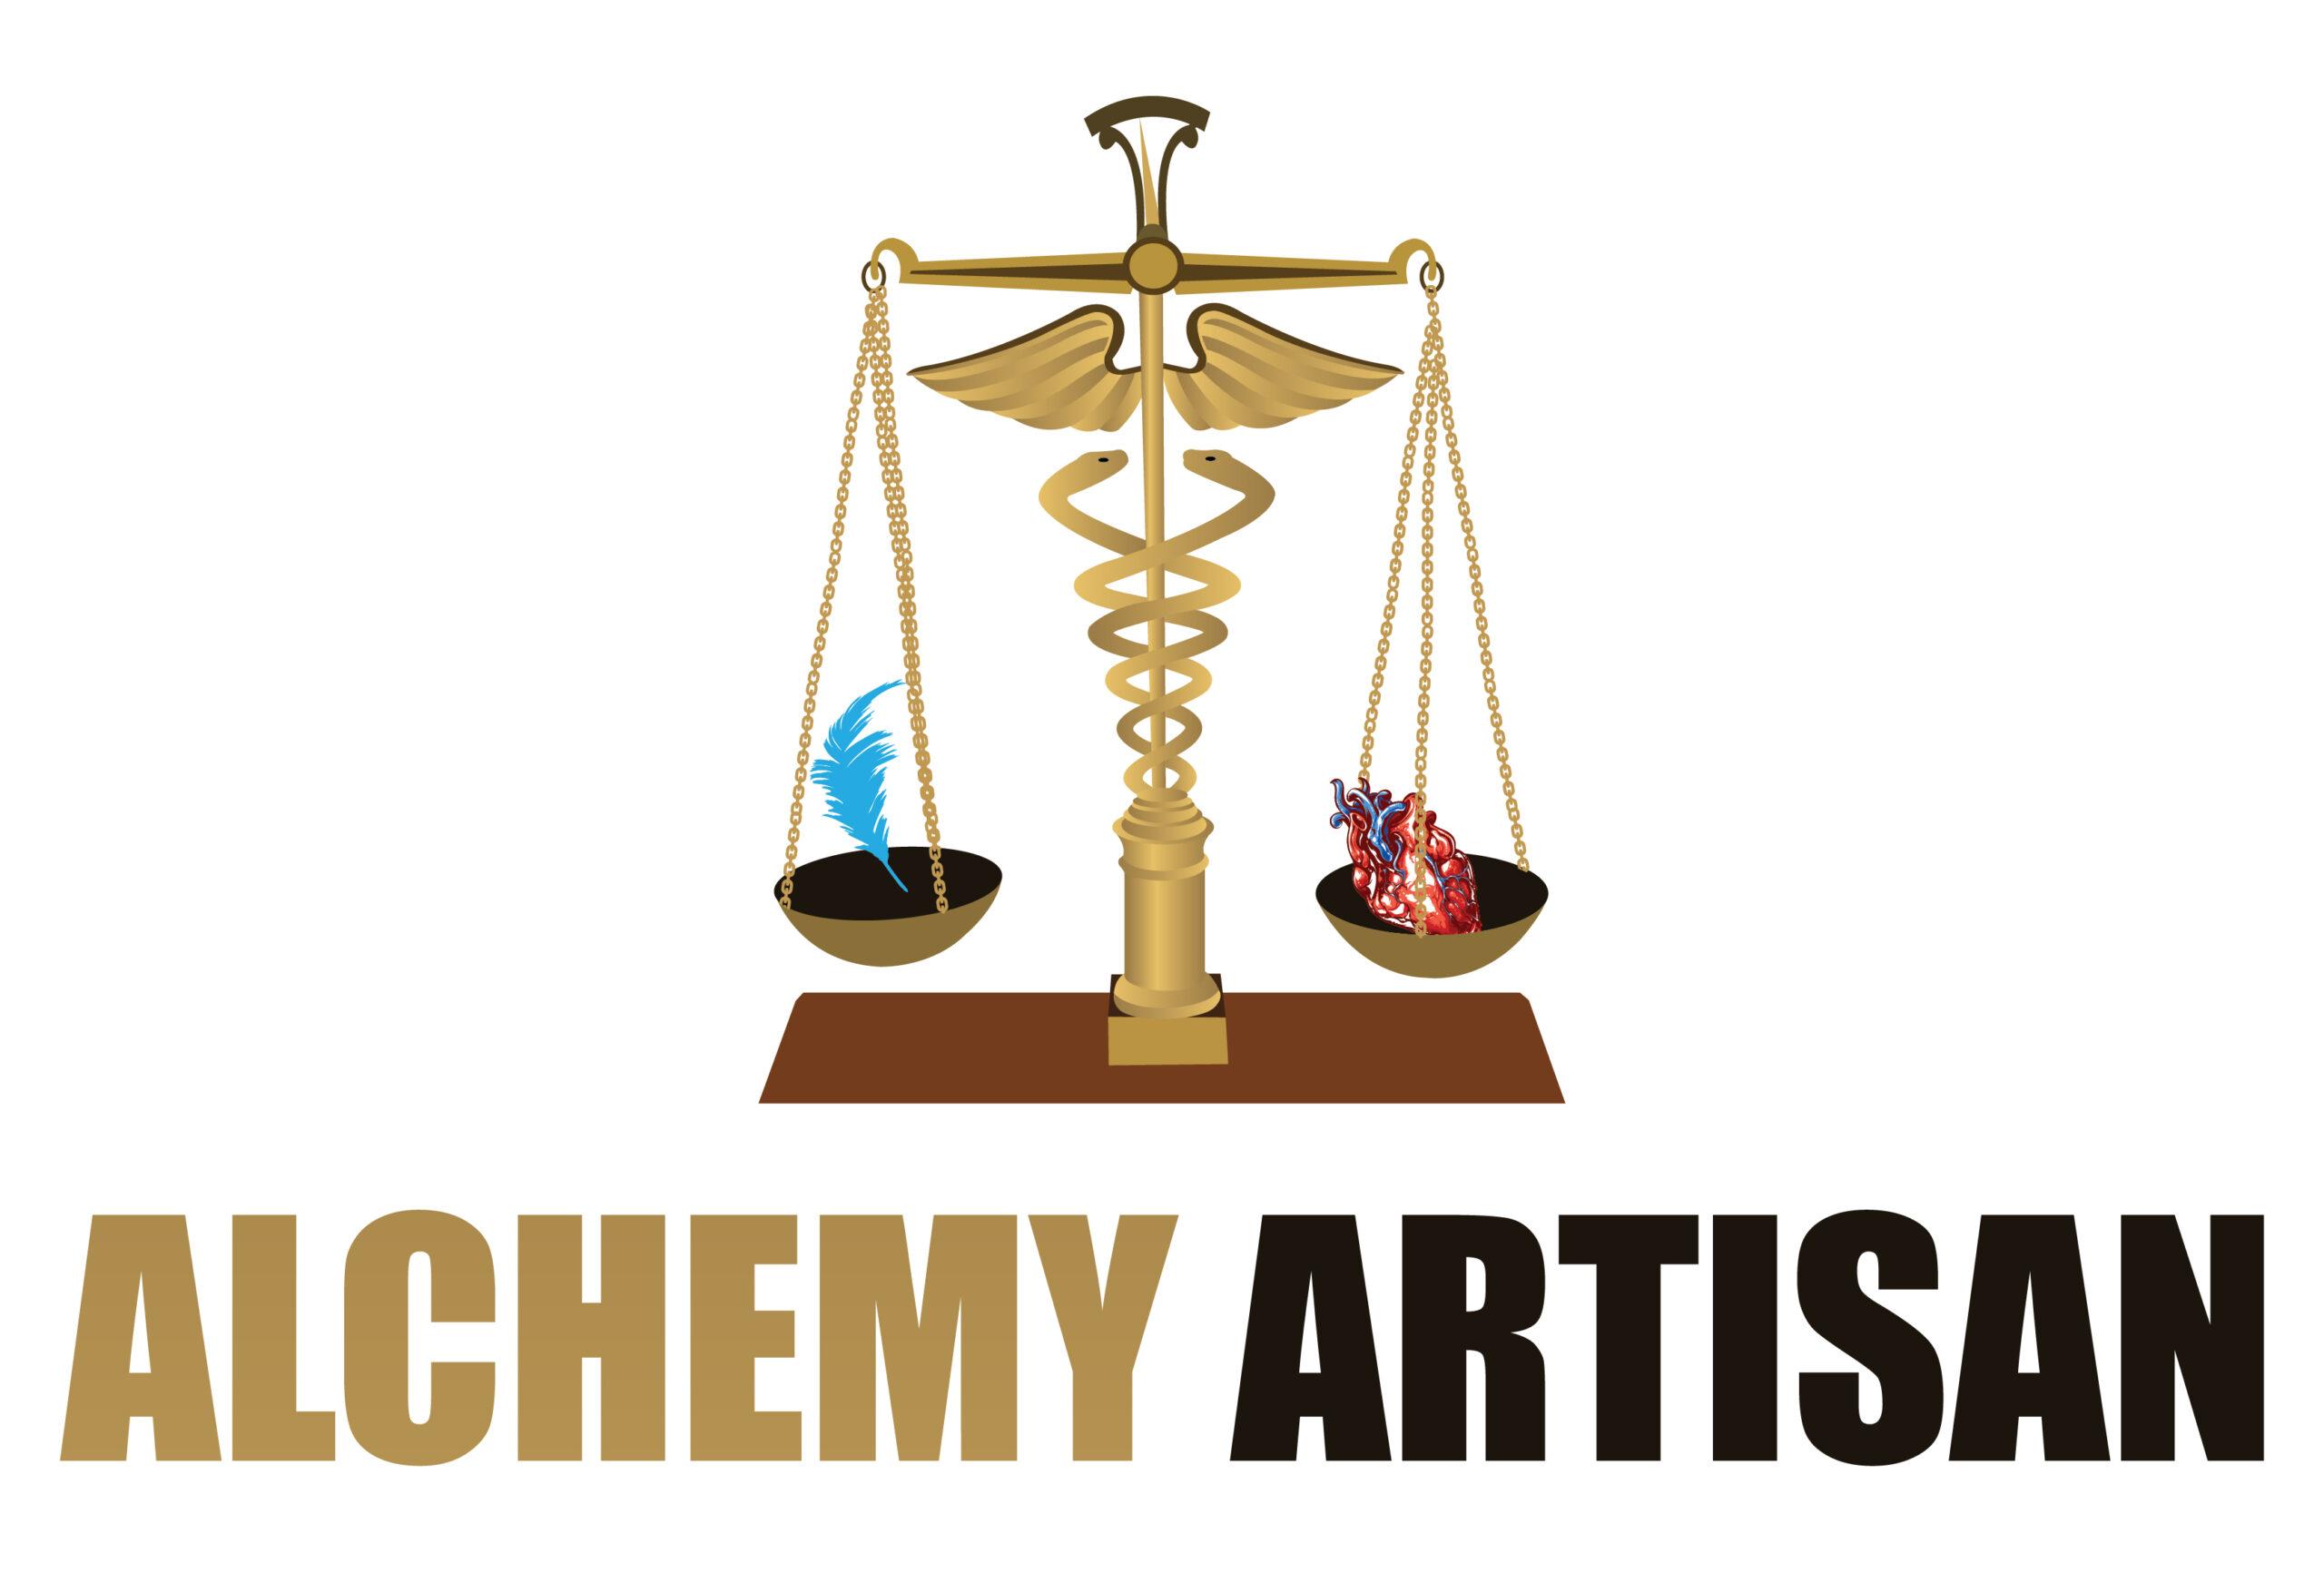 Alchemy Artisan